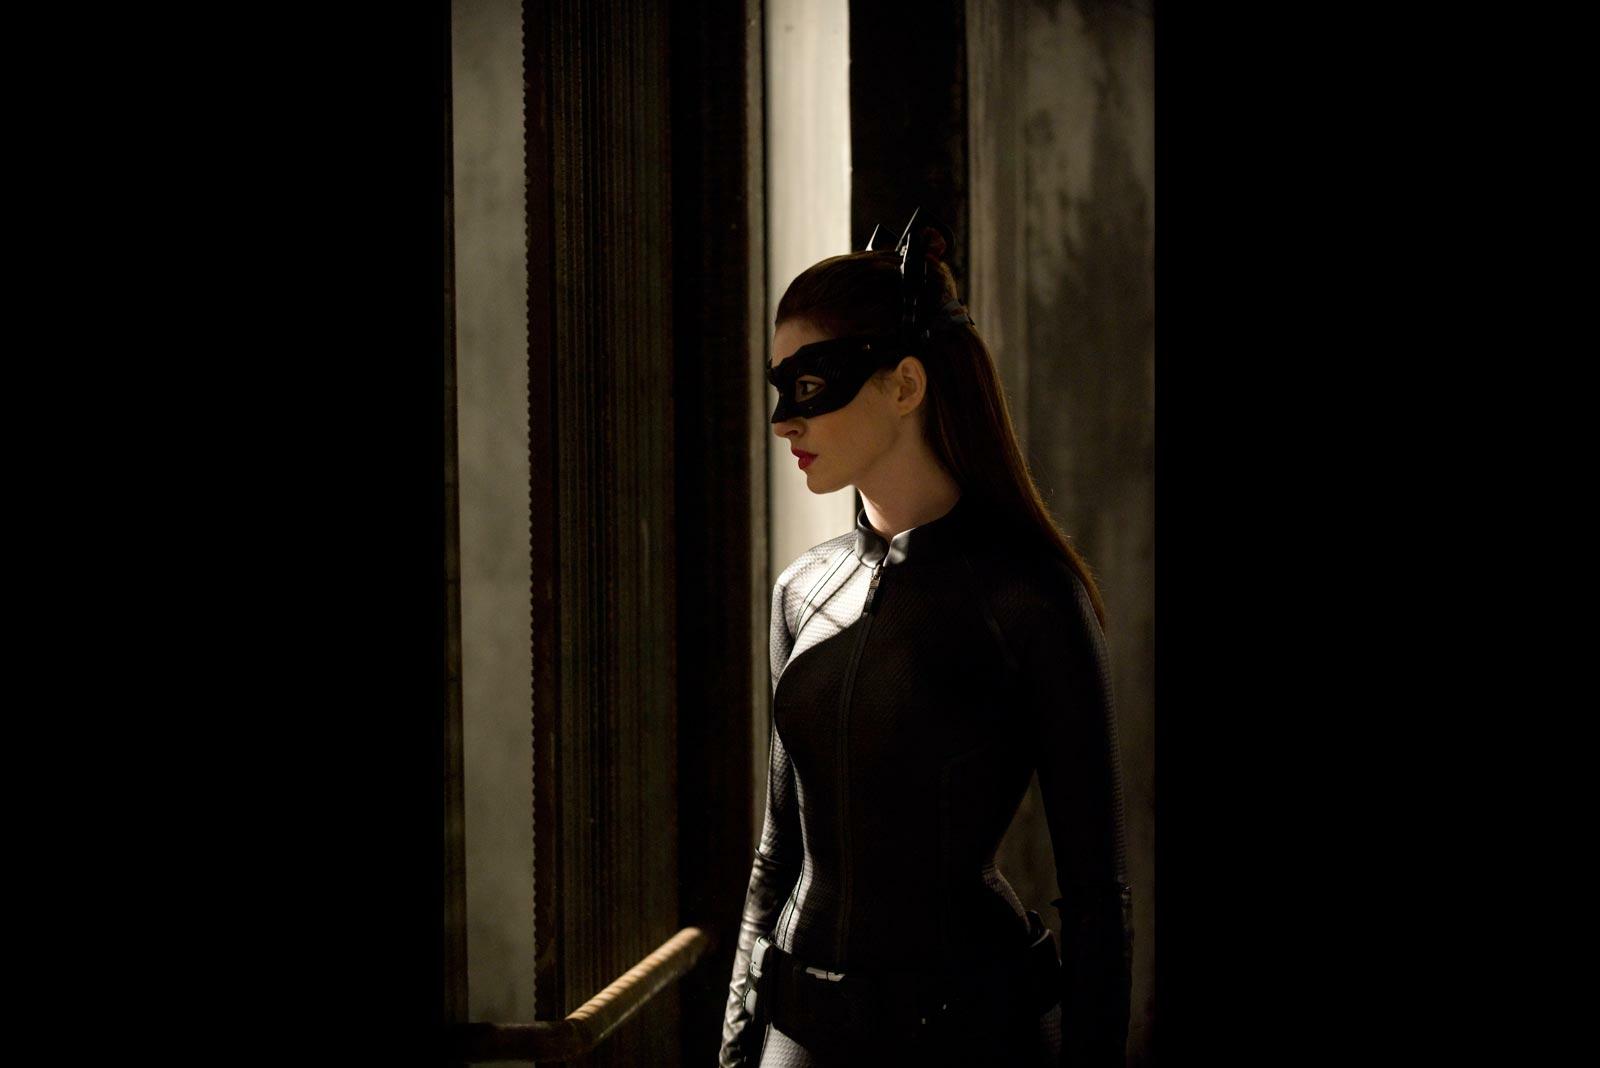 http://4.bp.blogspot.com/-axTihXKcQAo/UCTpTHX6drI/AAAAAAAAAEs/nvomr06dqa0/s1600/dark-knight-rises-HD-photo-catwoman.png